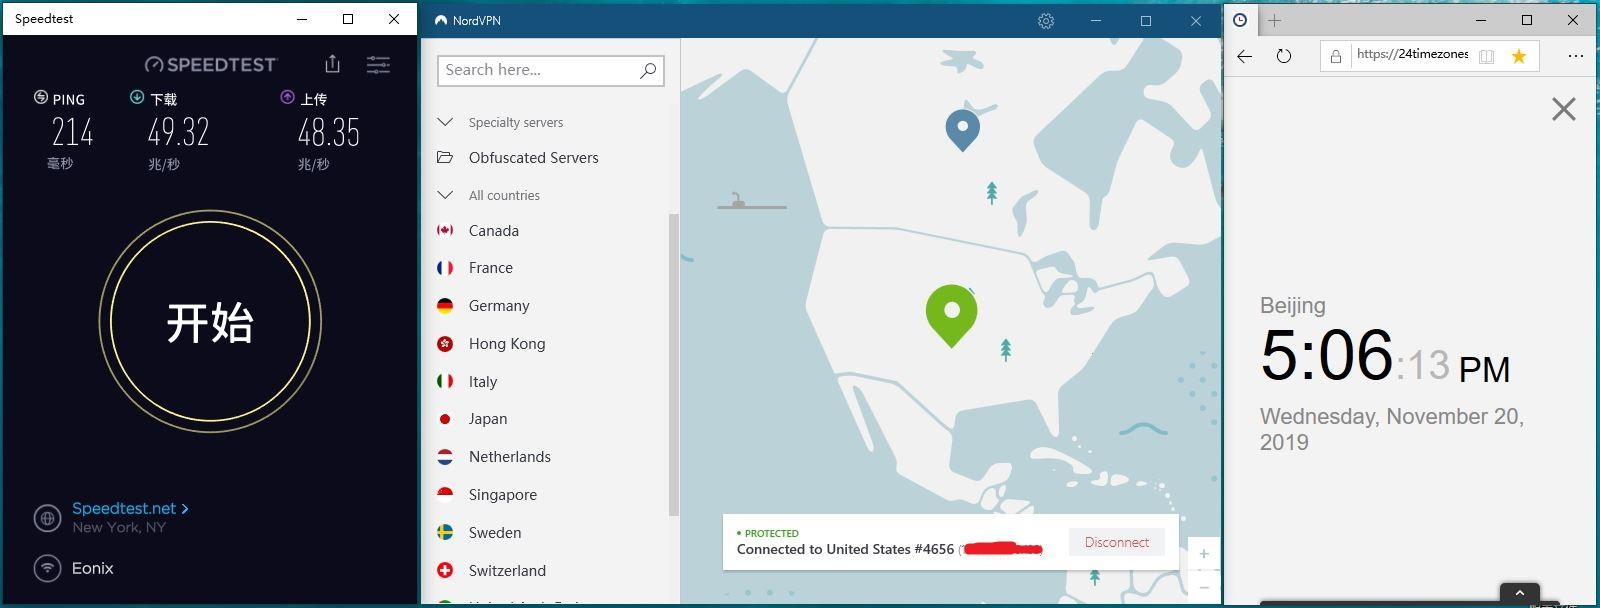 WindowsNordVPN USA 4656 中国VPN翻墙 科学上网 Speedtest - 20191120